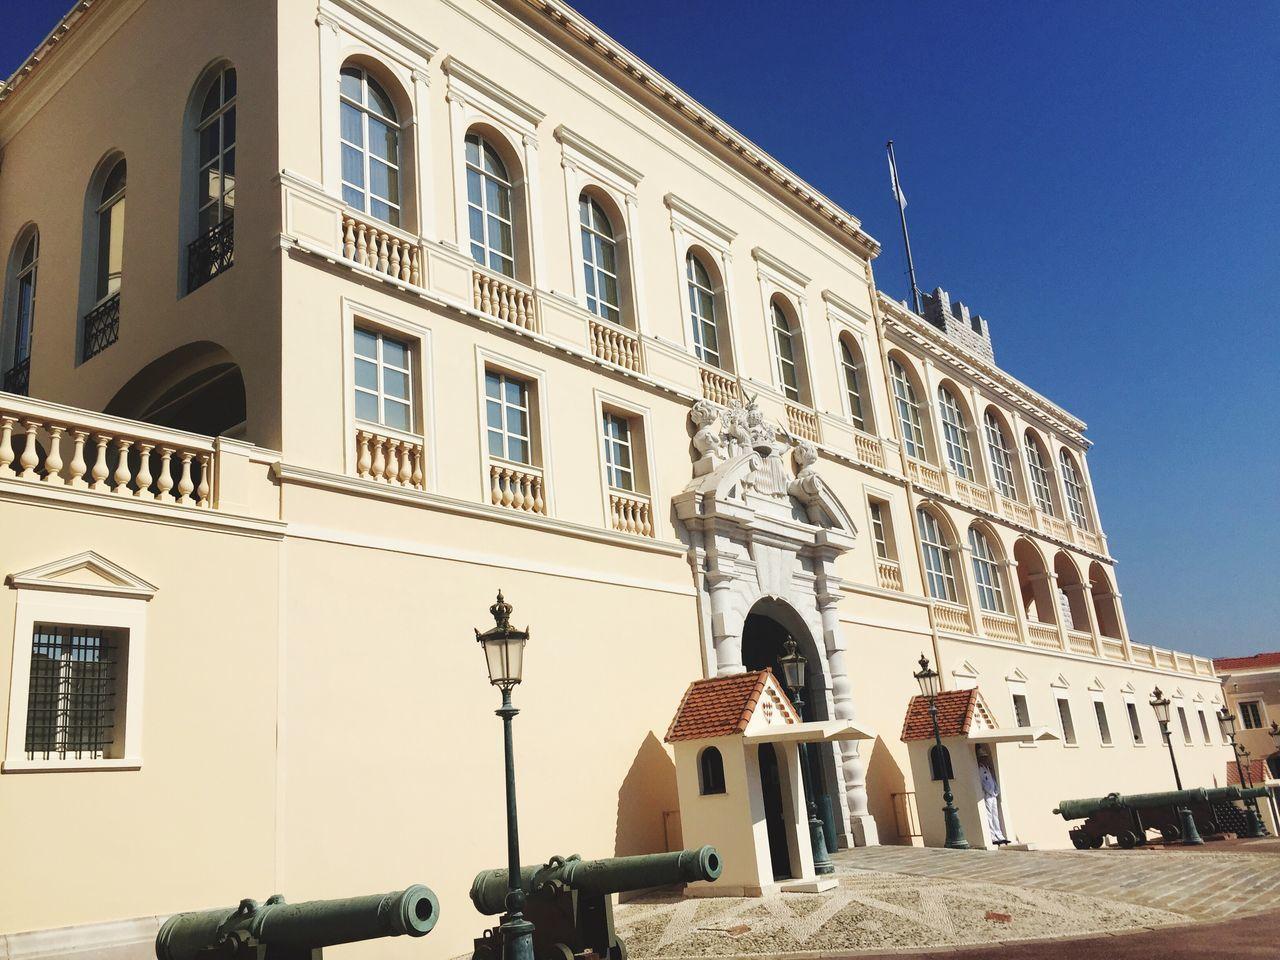 Princes Palace Monaco Montecarlo 🇮🇩🇫🇷